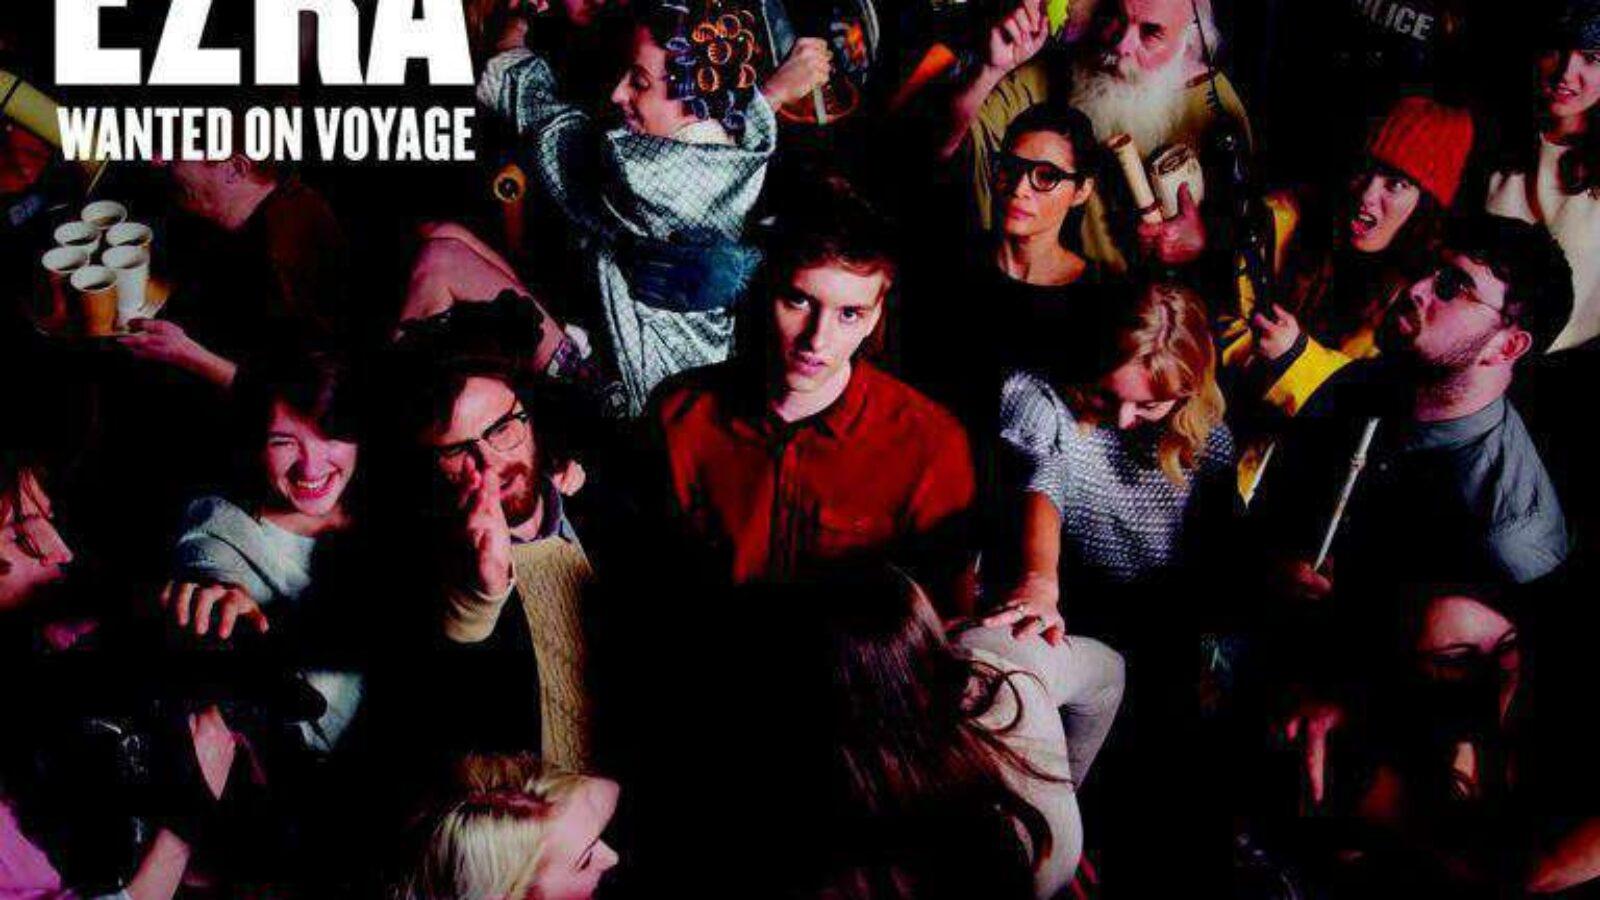 CD des Monats: GEORGE EZRA – Wanted On Voyage #1 (Juni)